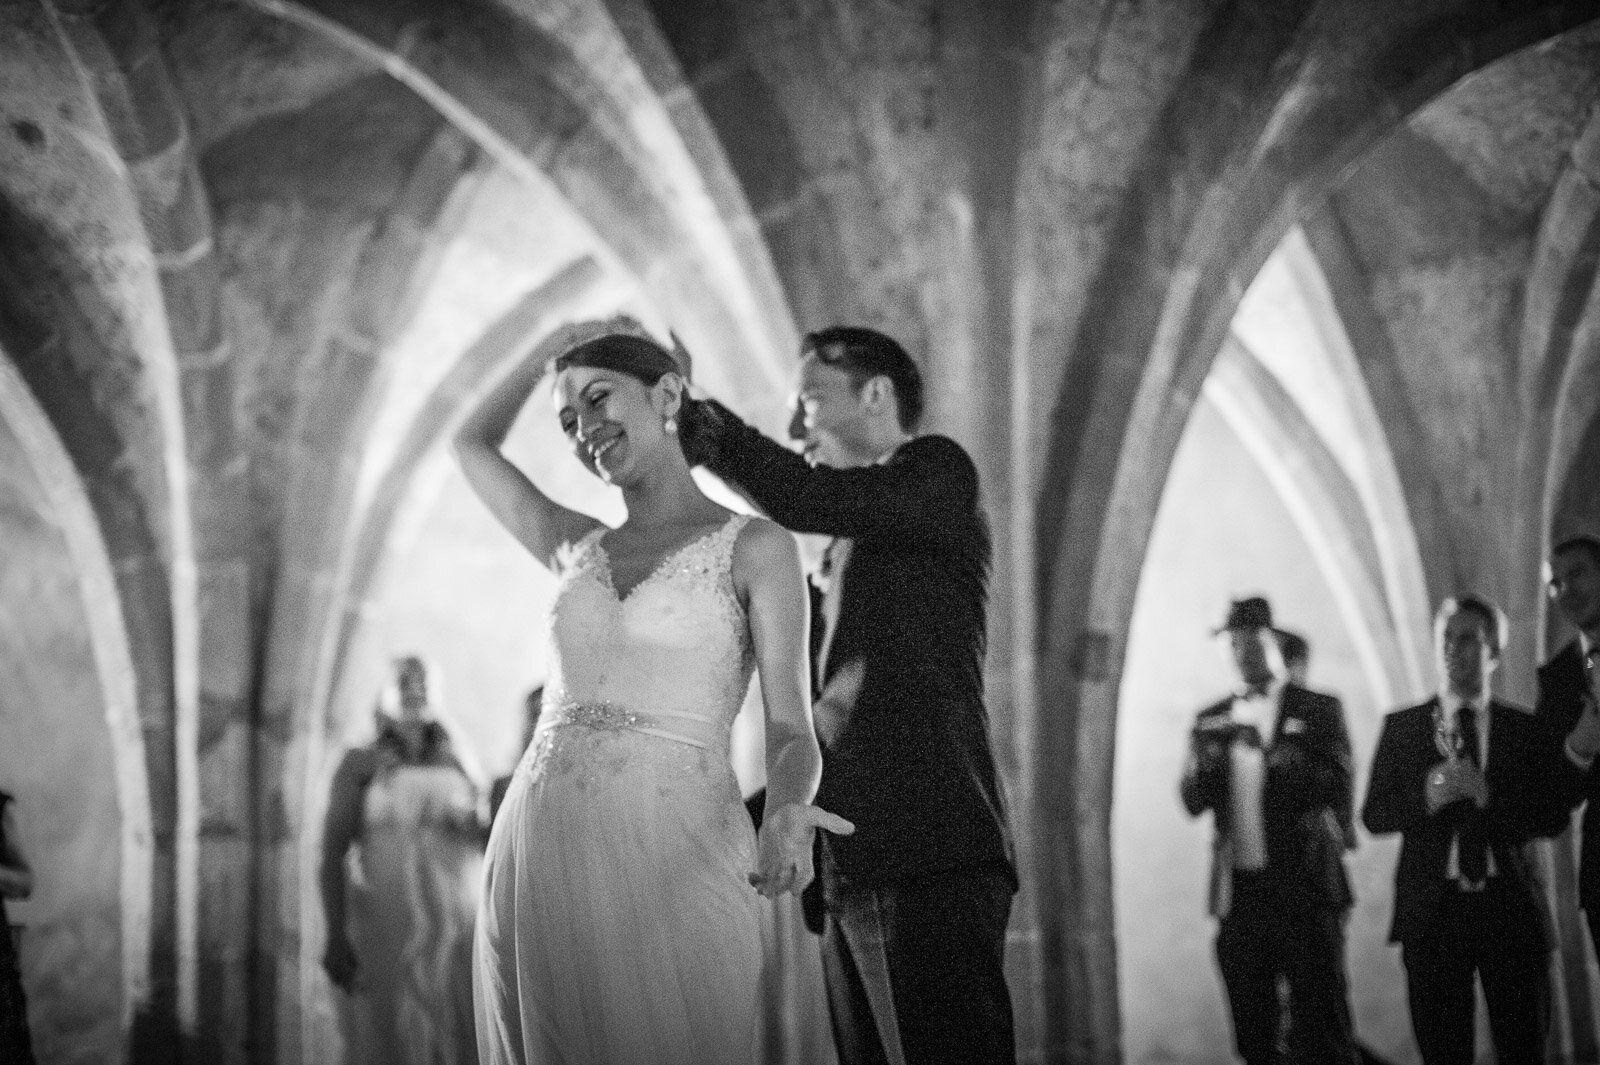 Russian Wedding in Villa Cimbrone Costiera Amalfitana 31.jpg